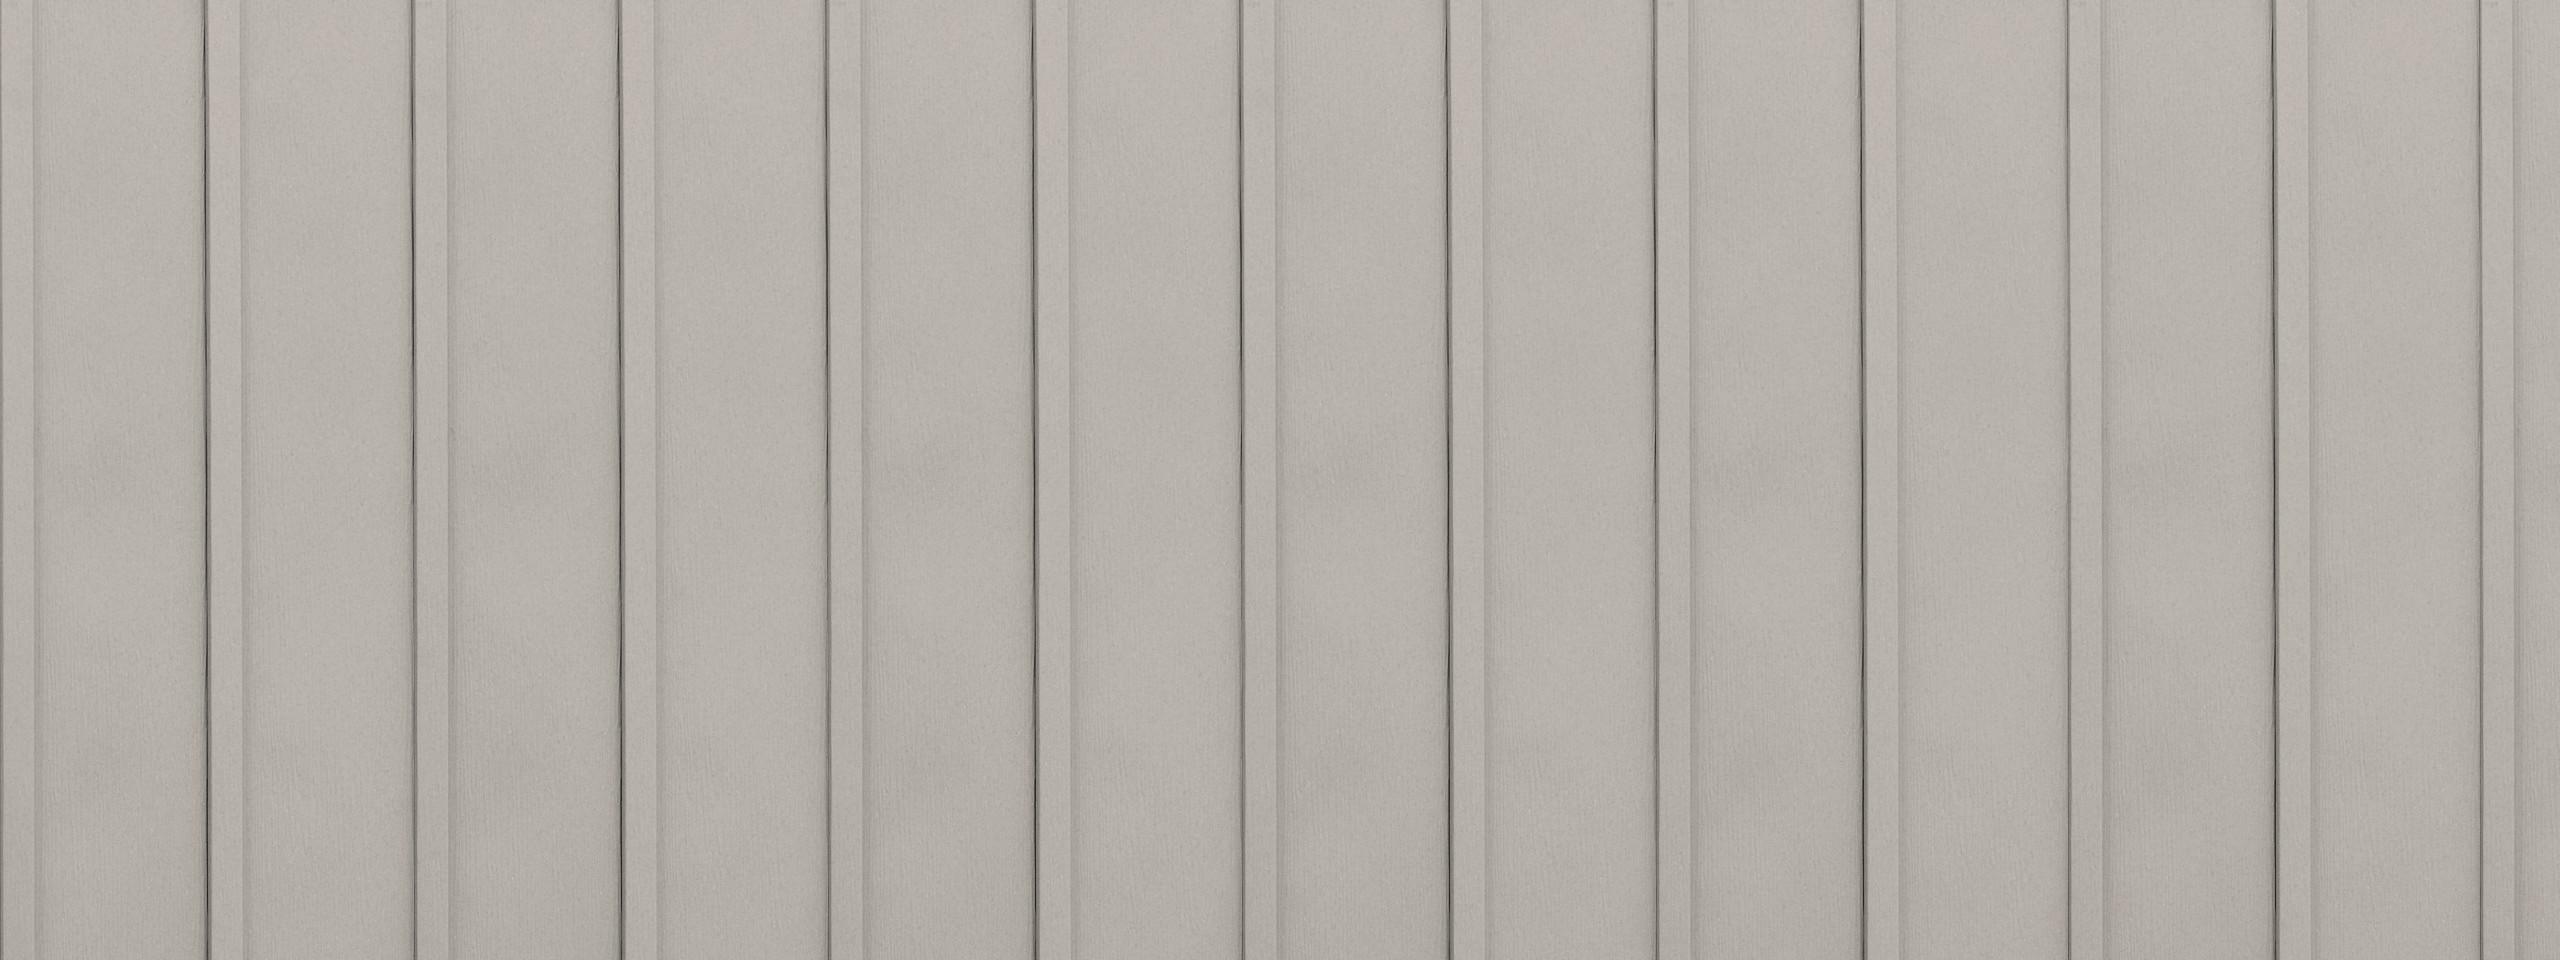 Entex vertical desert tone board and batten steel siding